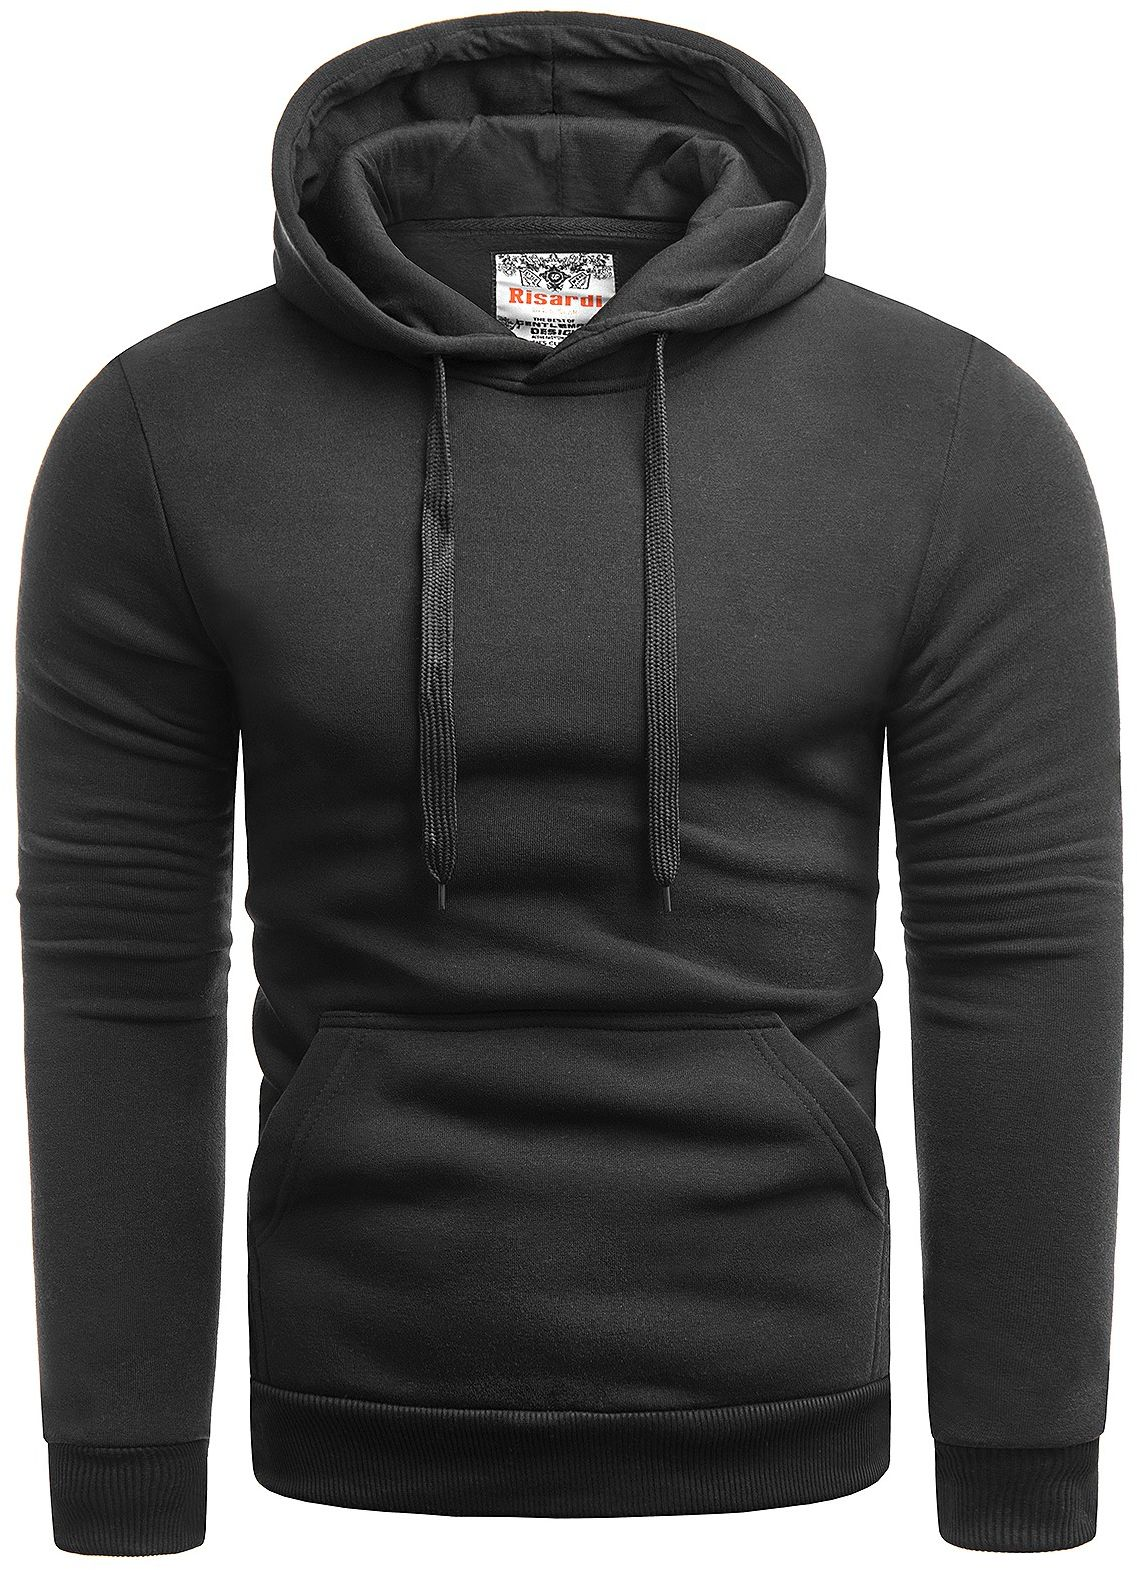 Męska fajna bluza SG1 - czarna